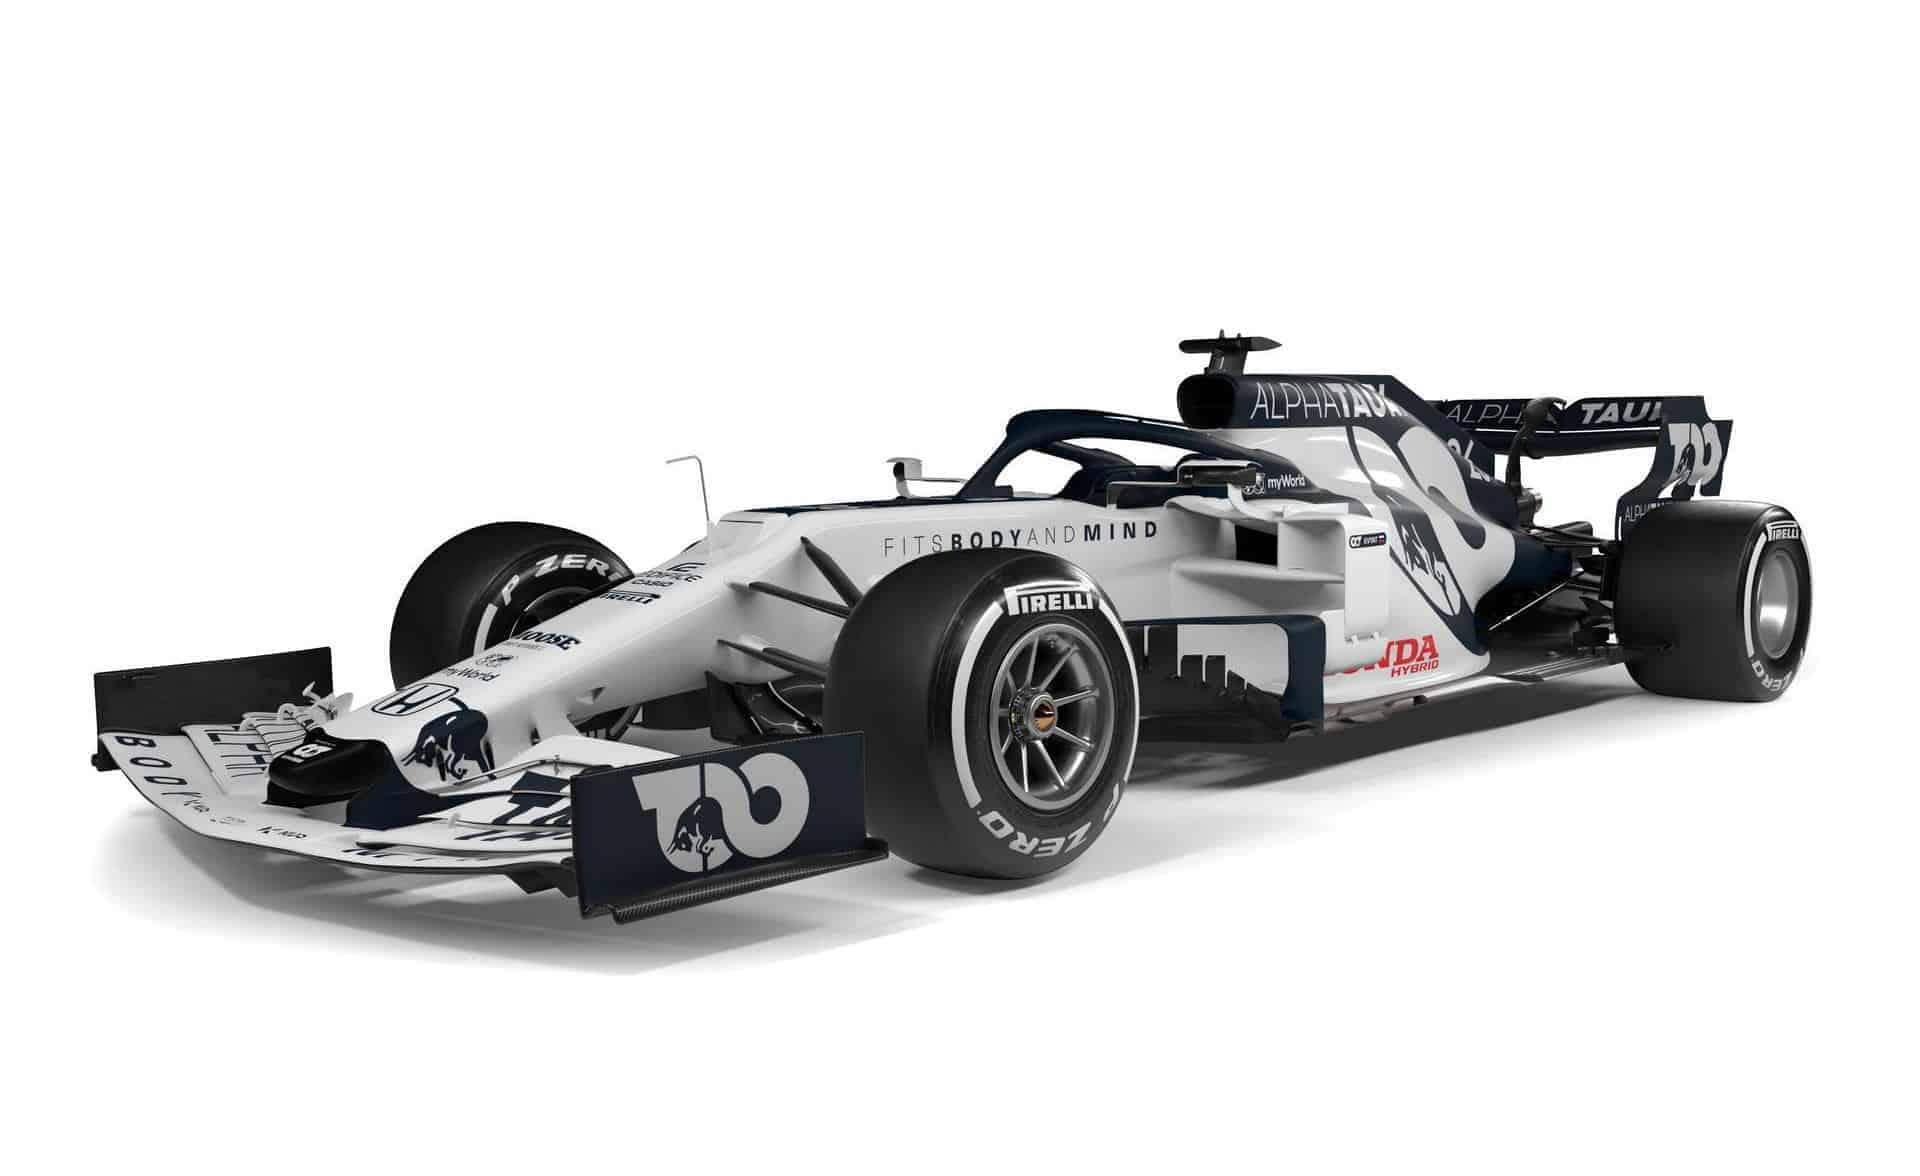 Scuderia AlphaTauri F1 2020 car AT01 side Photo Red Bull